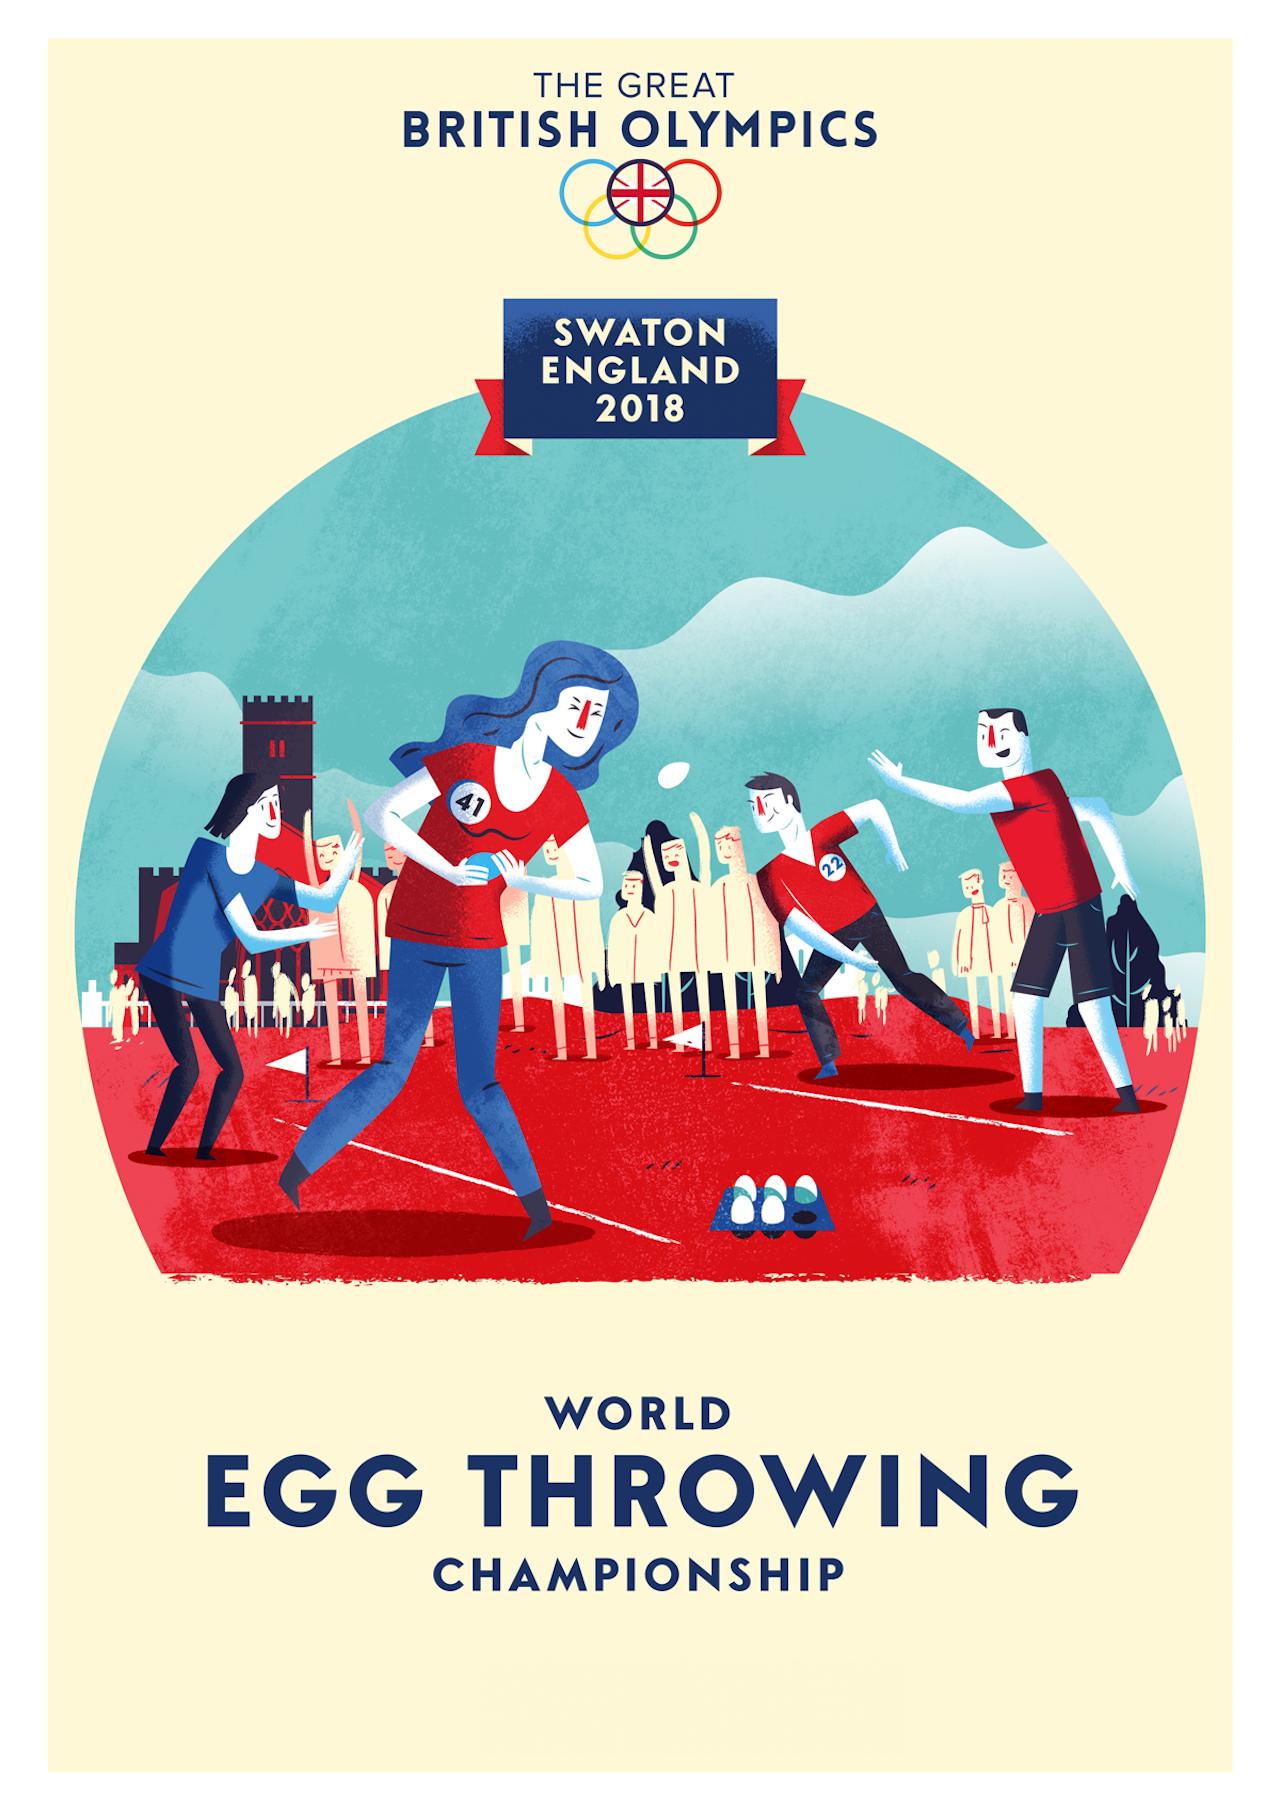 British Olympics_09 Egg Throwing